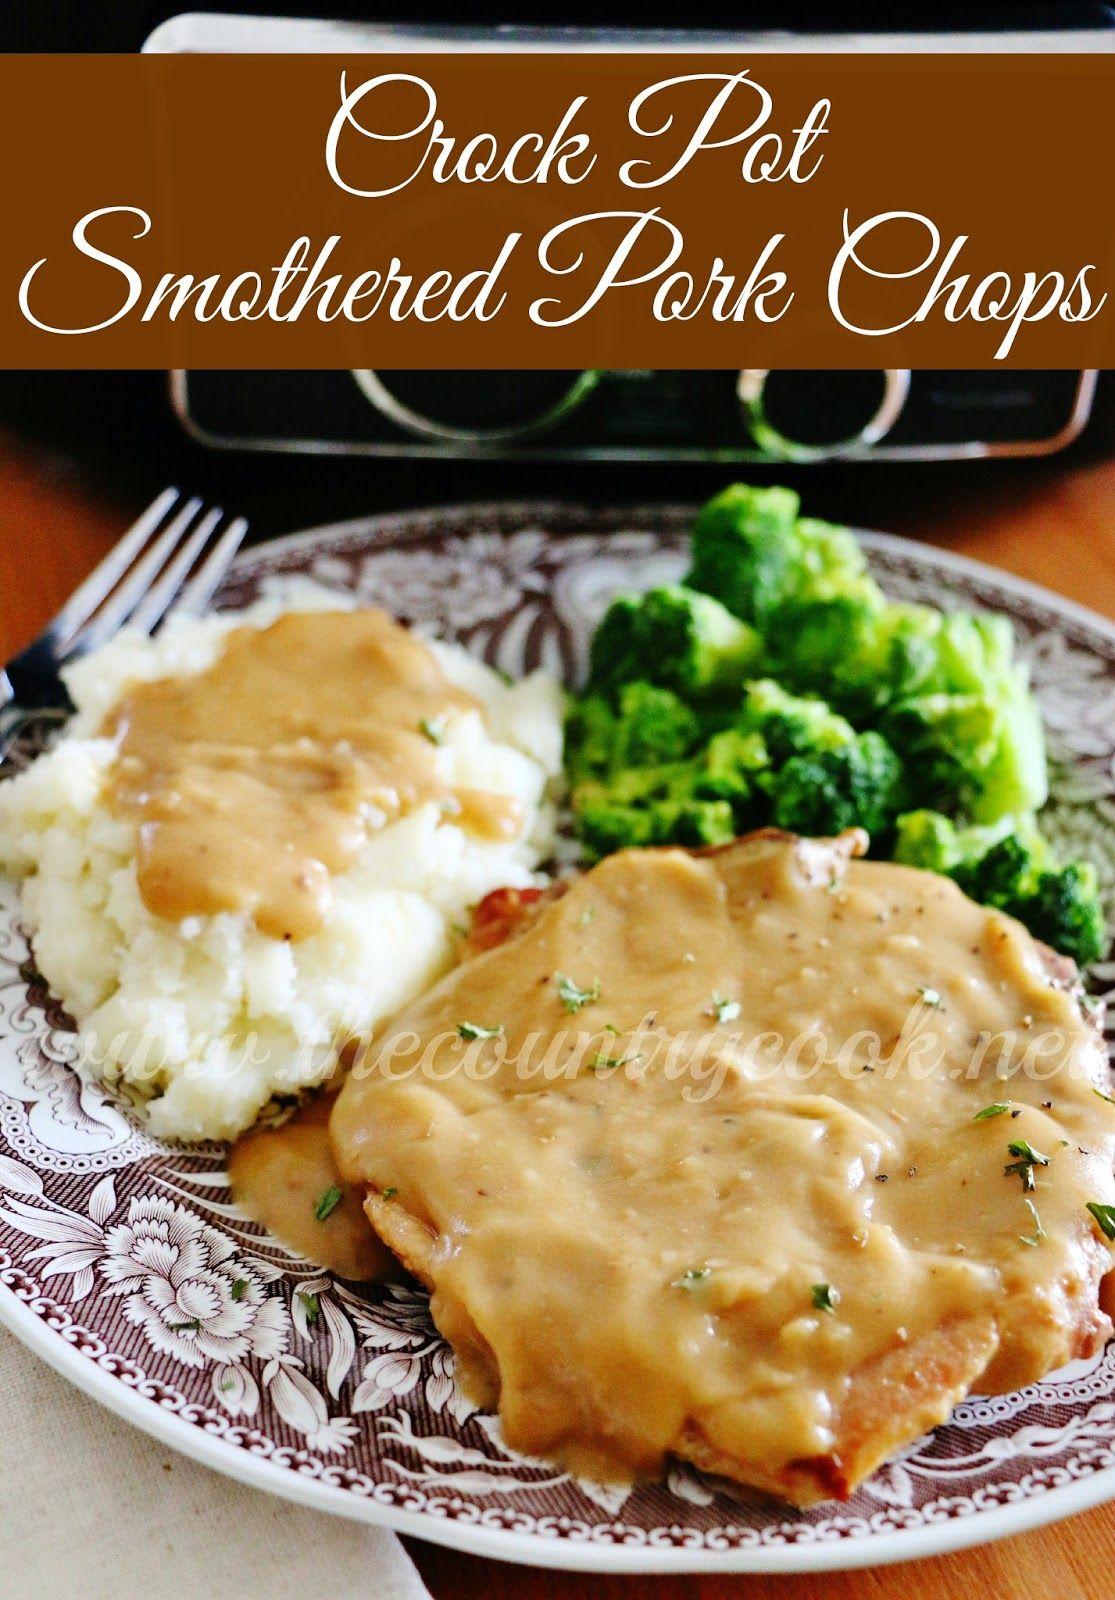 crock pot pork chop recipes with gravy Crock pot pork chops and gravy